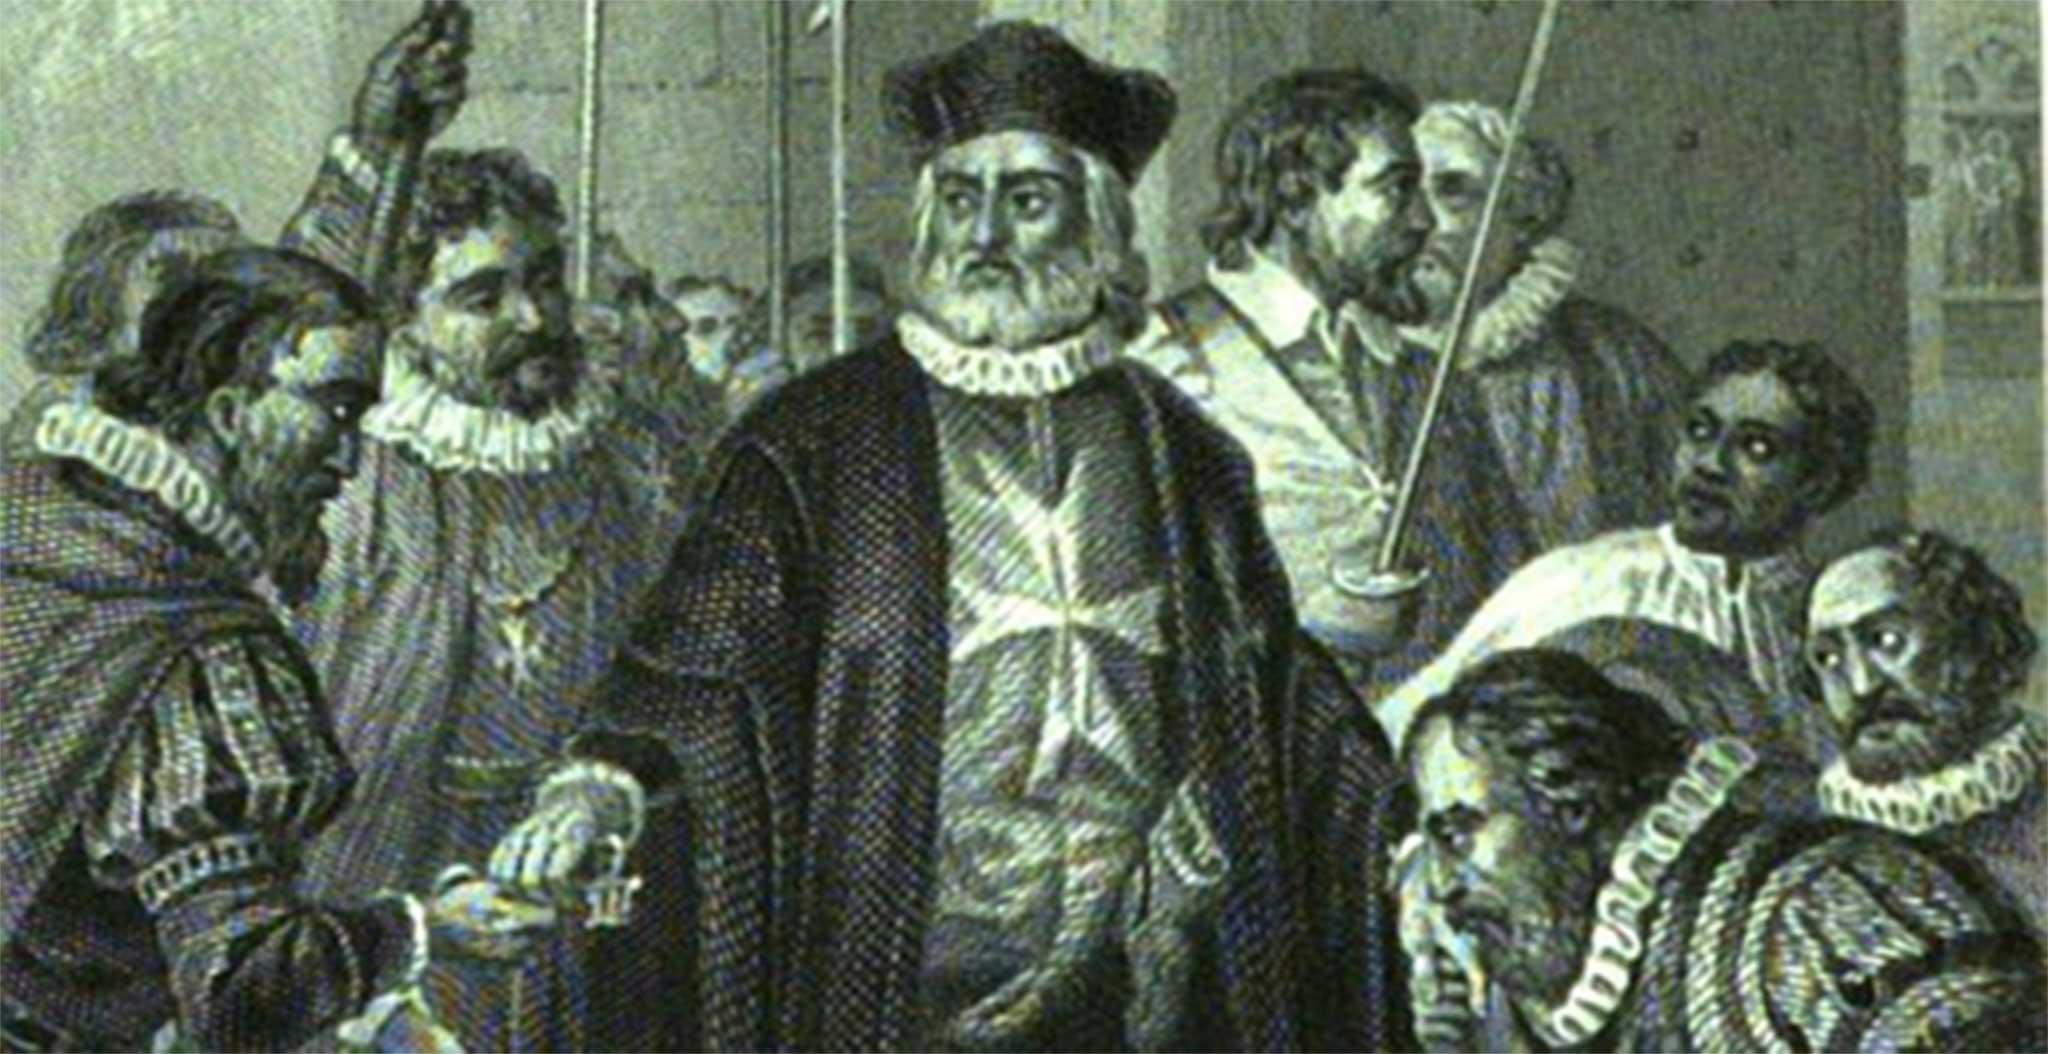 cavalieri gerolosimitani